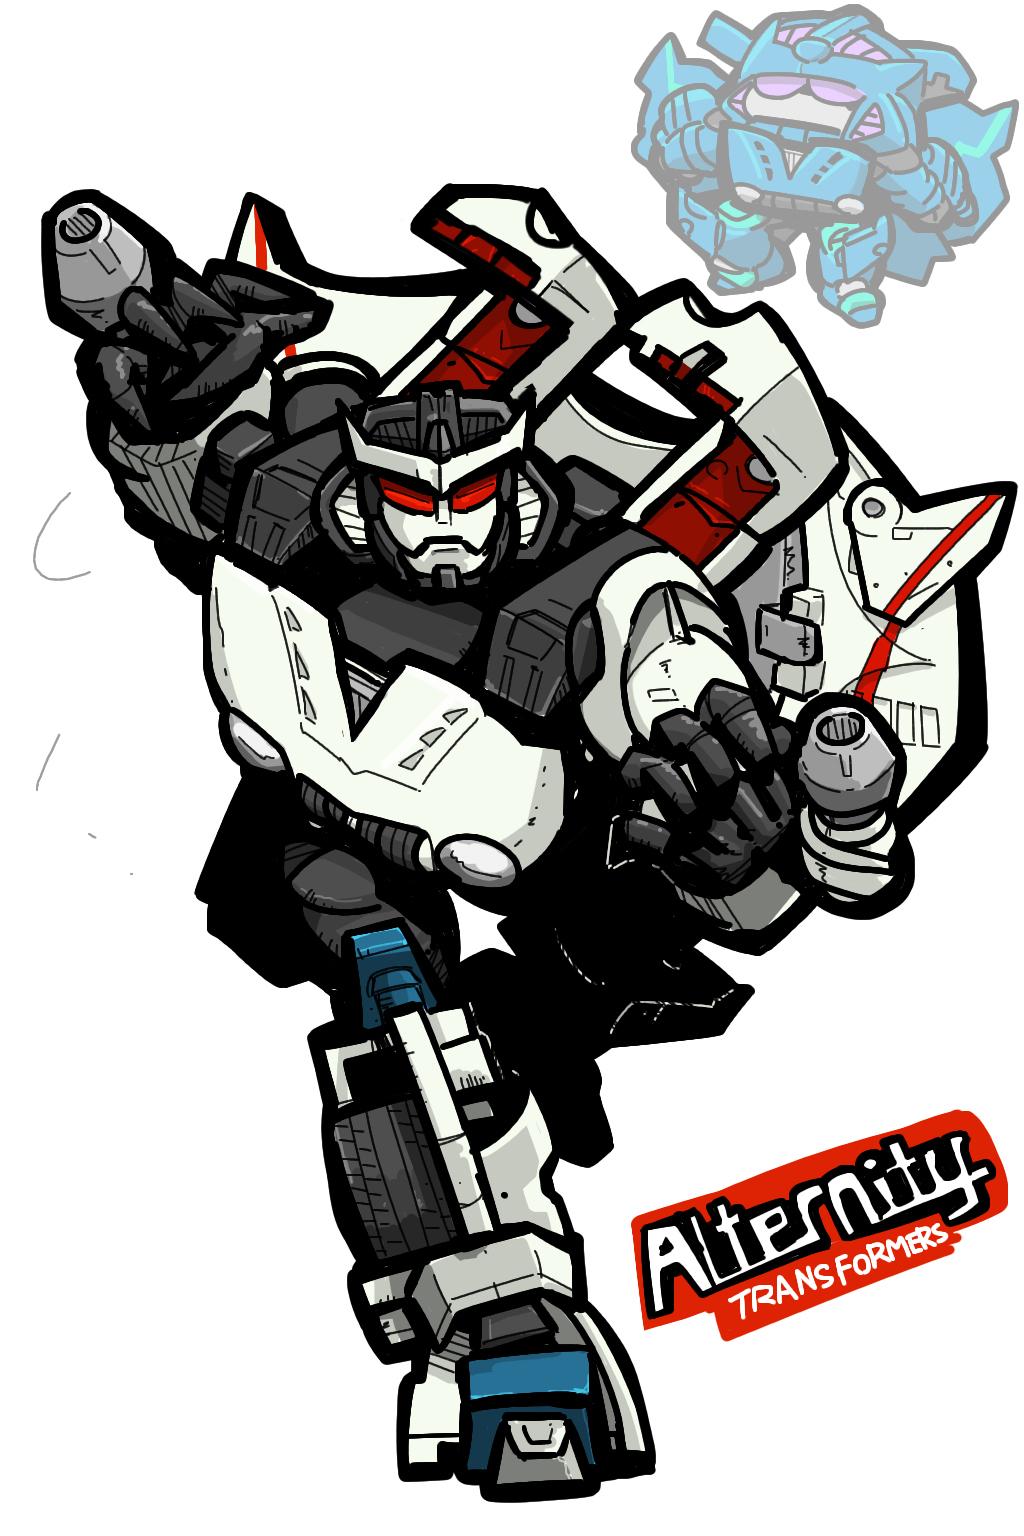 Transformers Alternity Starscream Thundercracker Mitsuoka Orochi